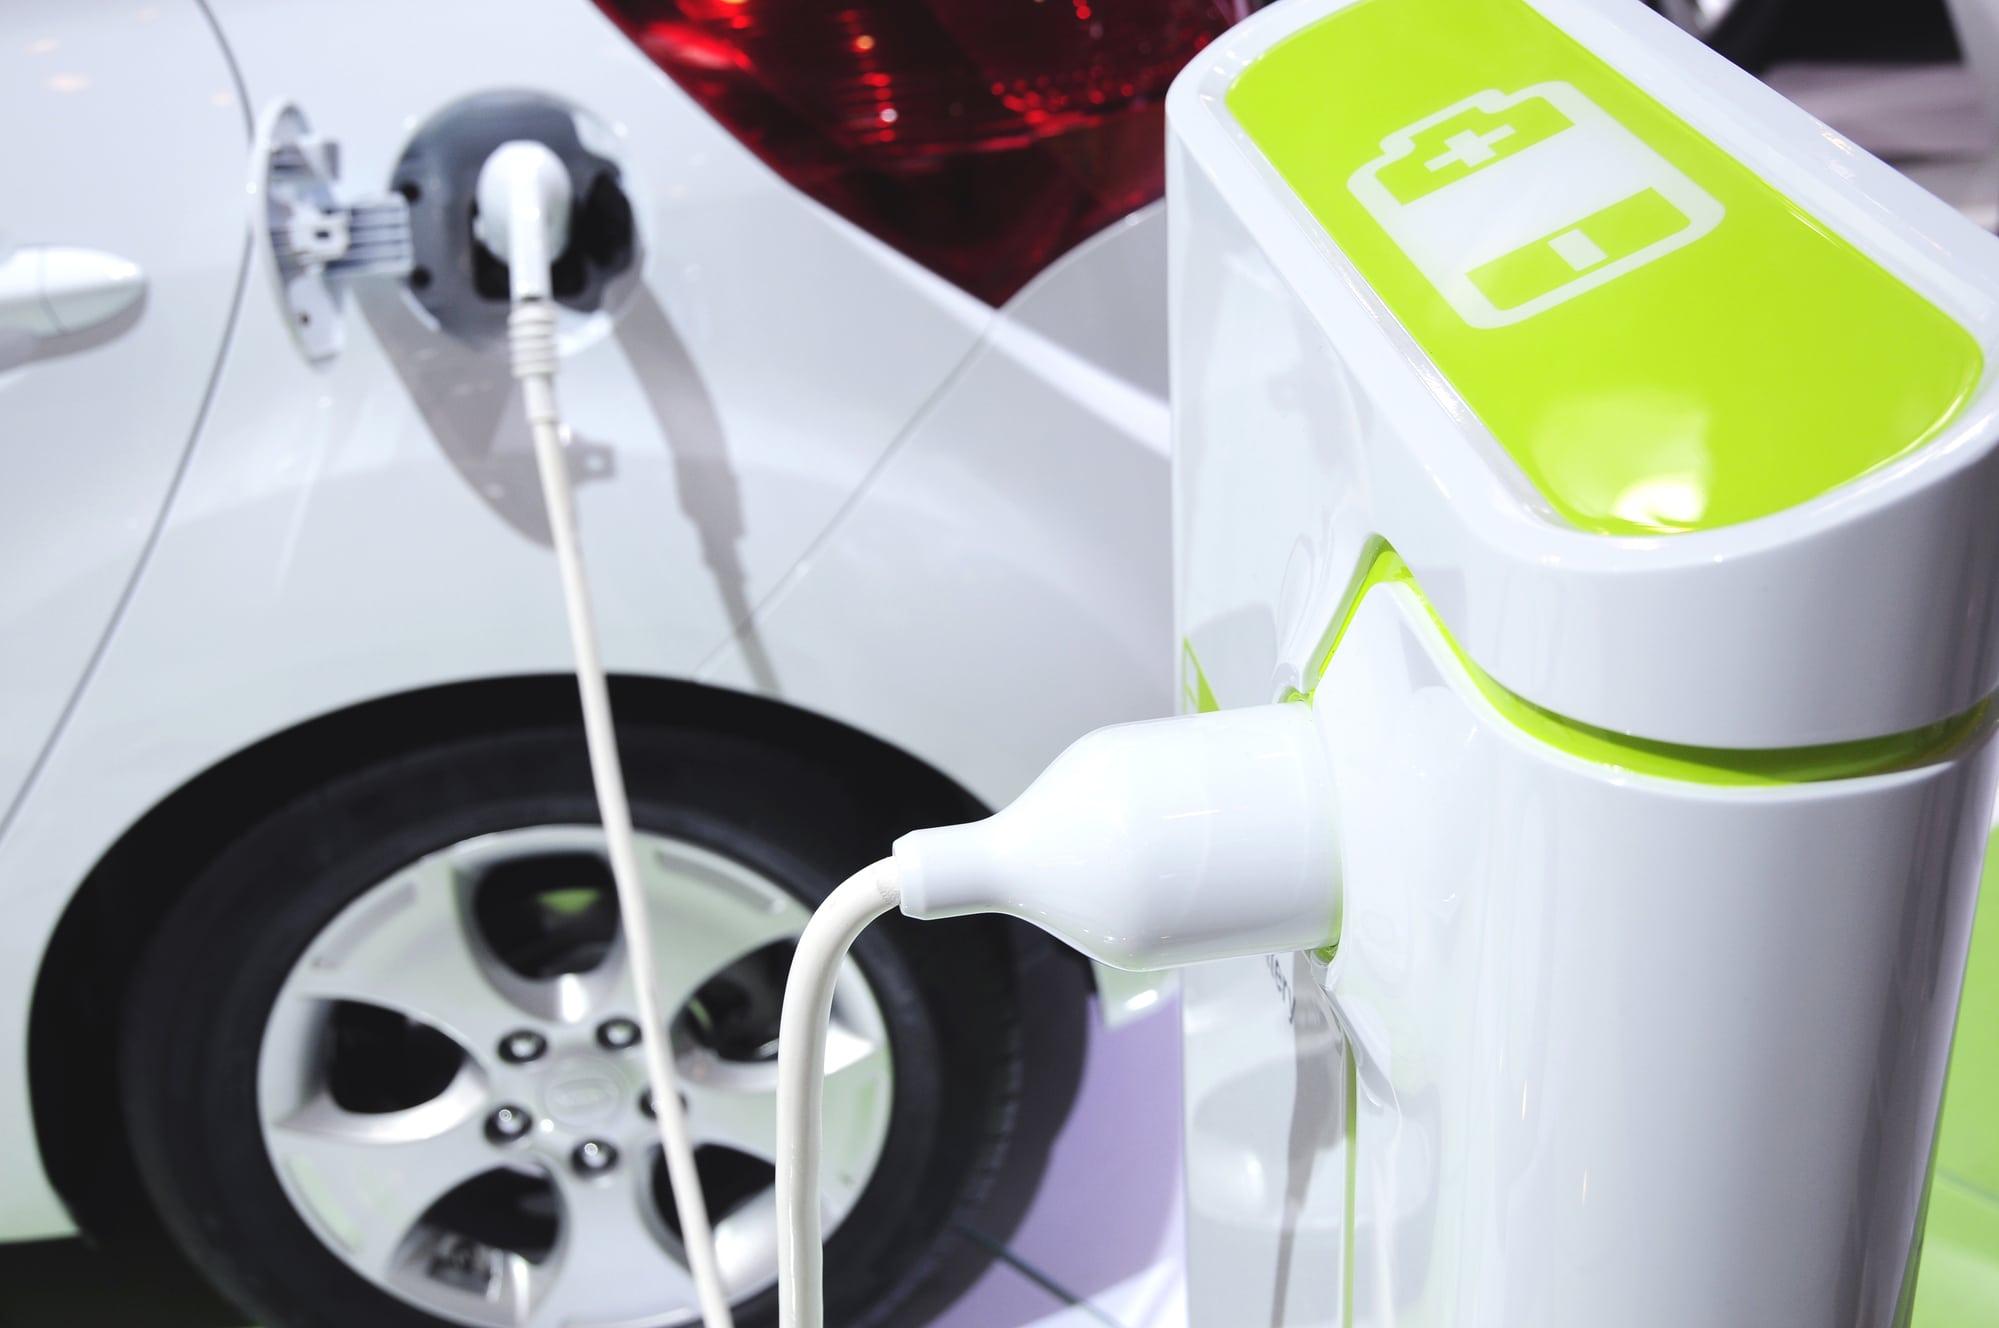 Commissione Europea: dal 2035 stop ufficiale ad auto ibride, benzina e diesel thumbnail